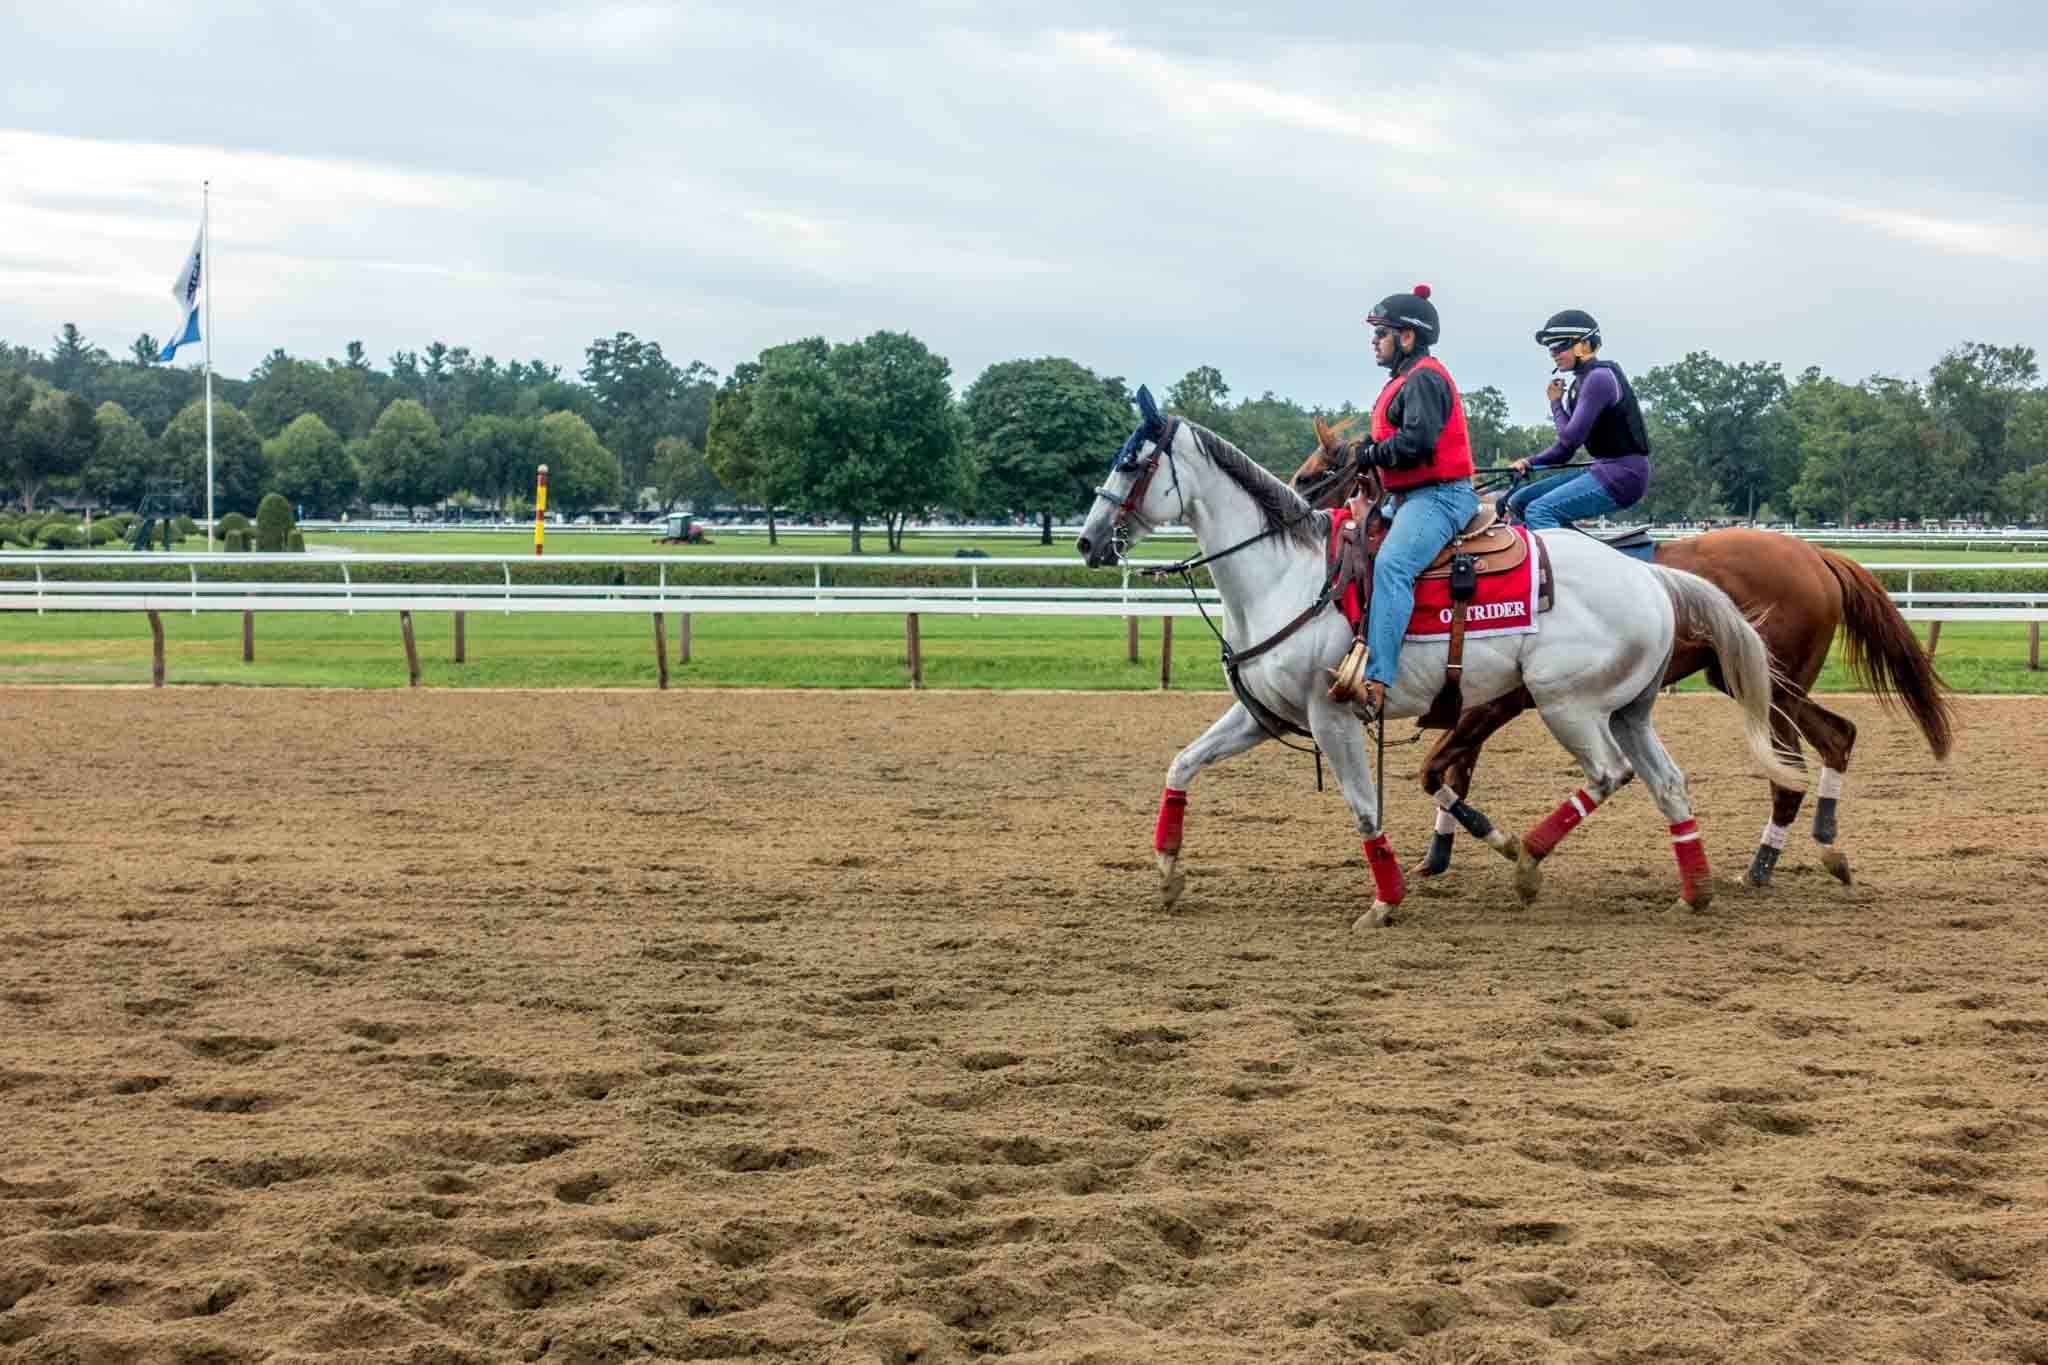 Horses on race track